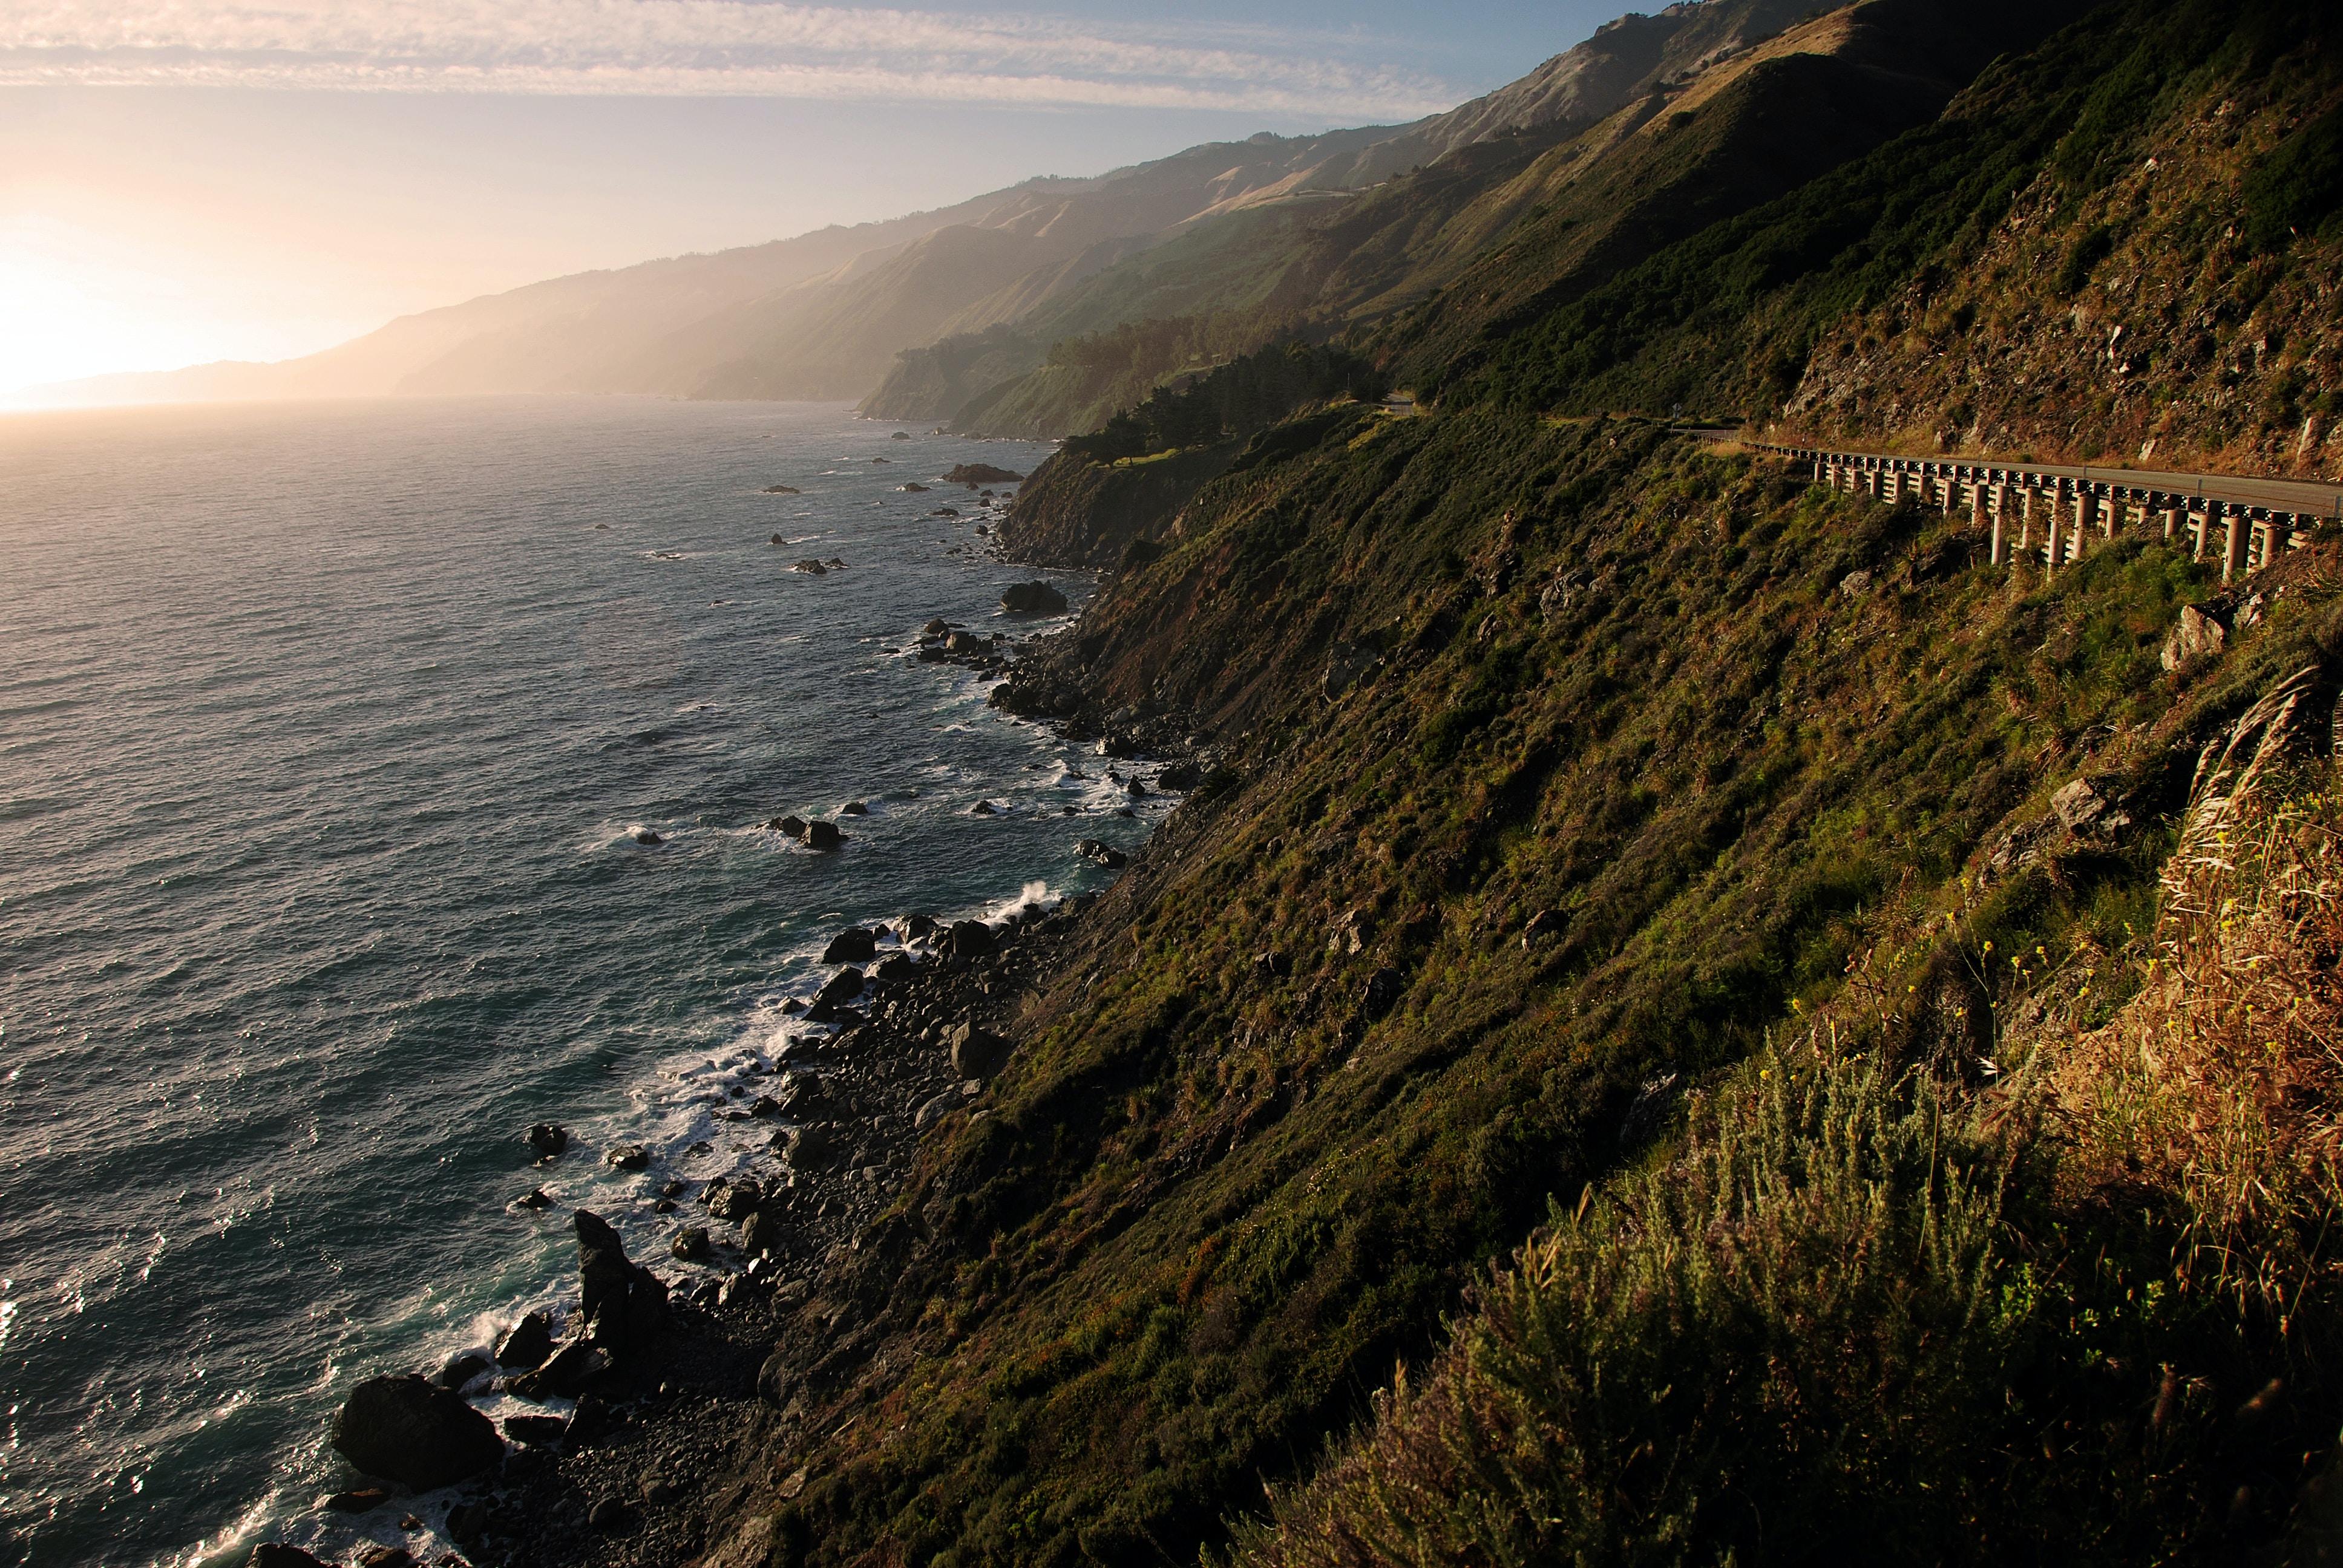 road near seashore during daytime